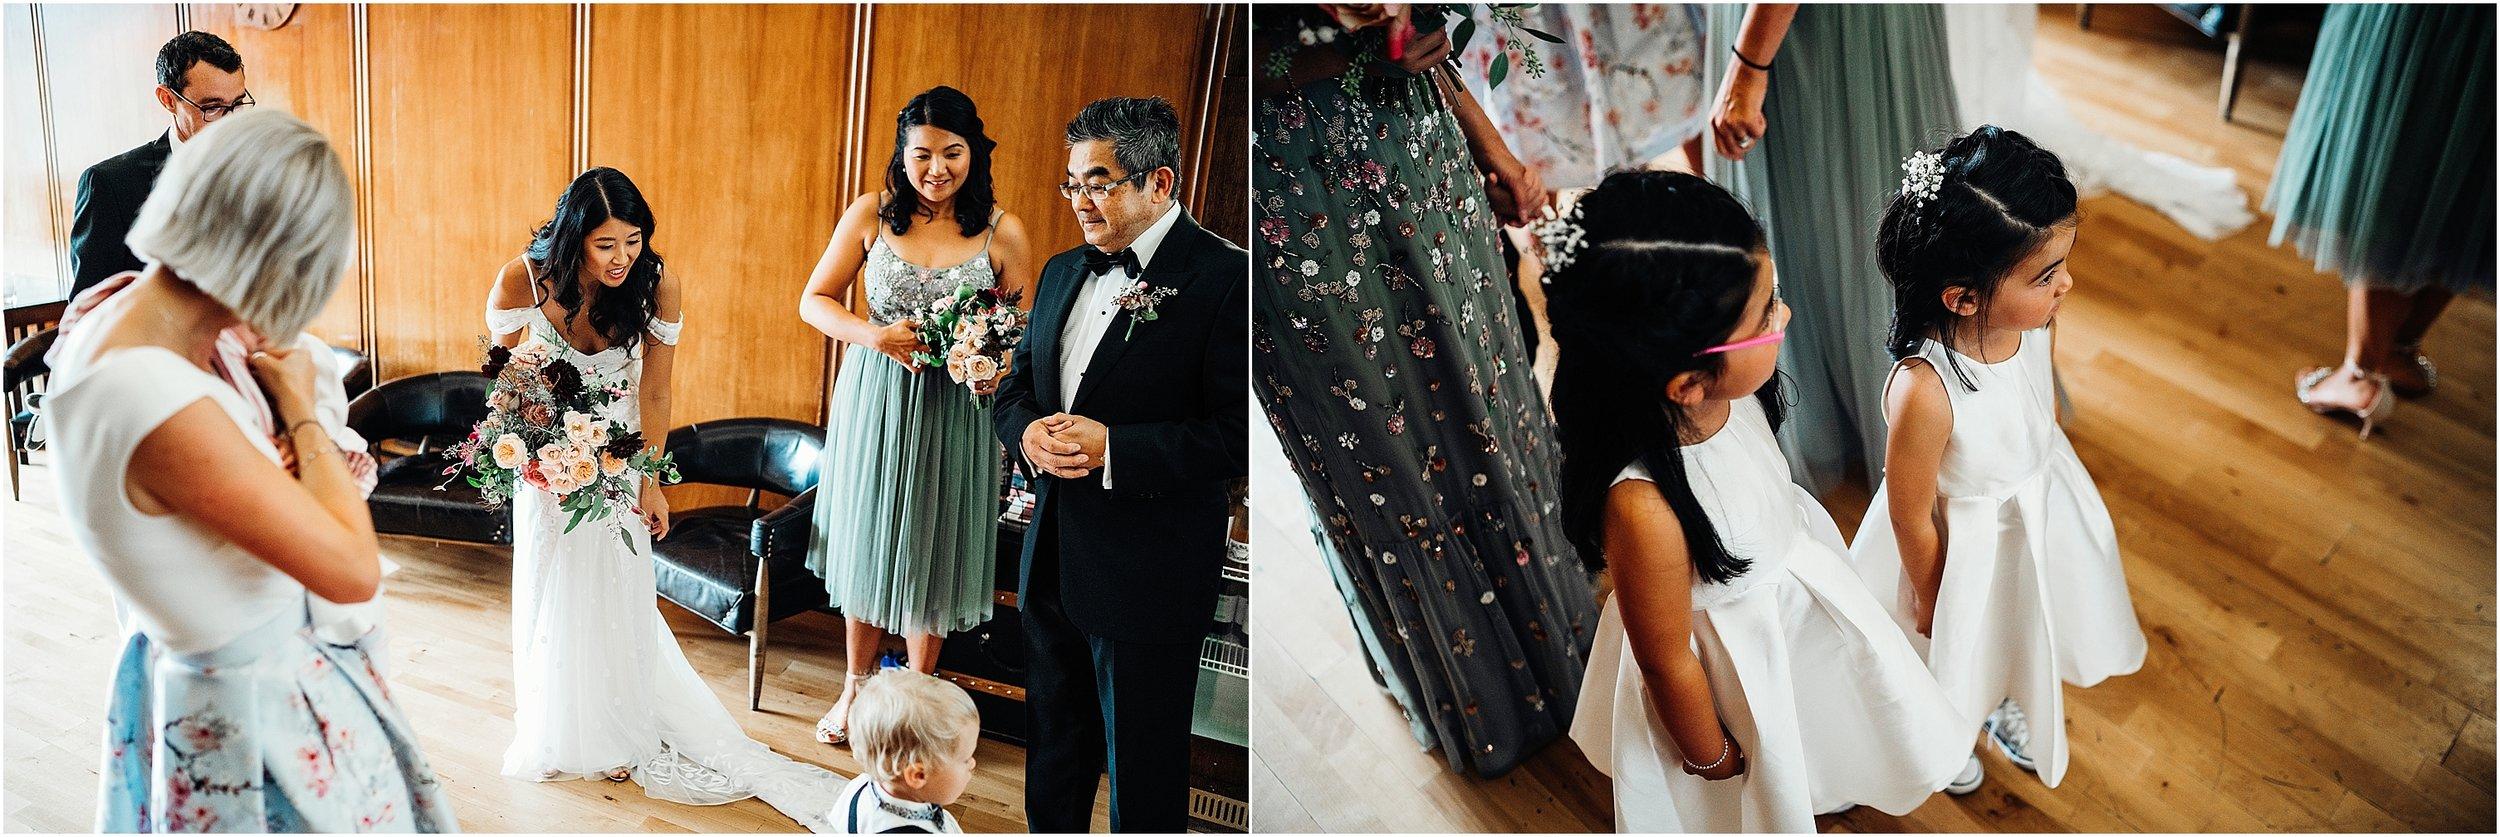 bethnal green town hall hotel wedding_0019.jpg